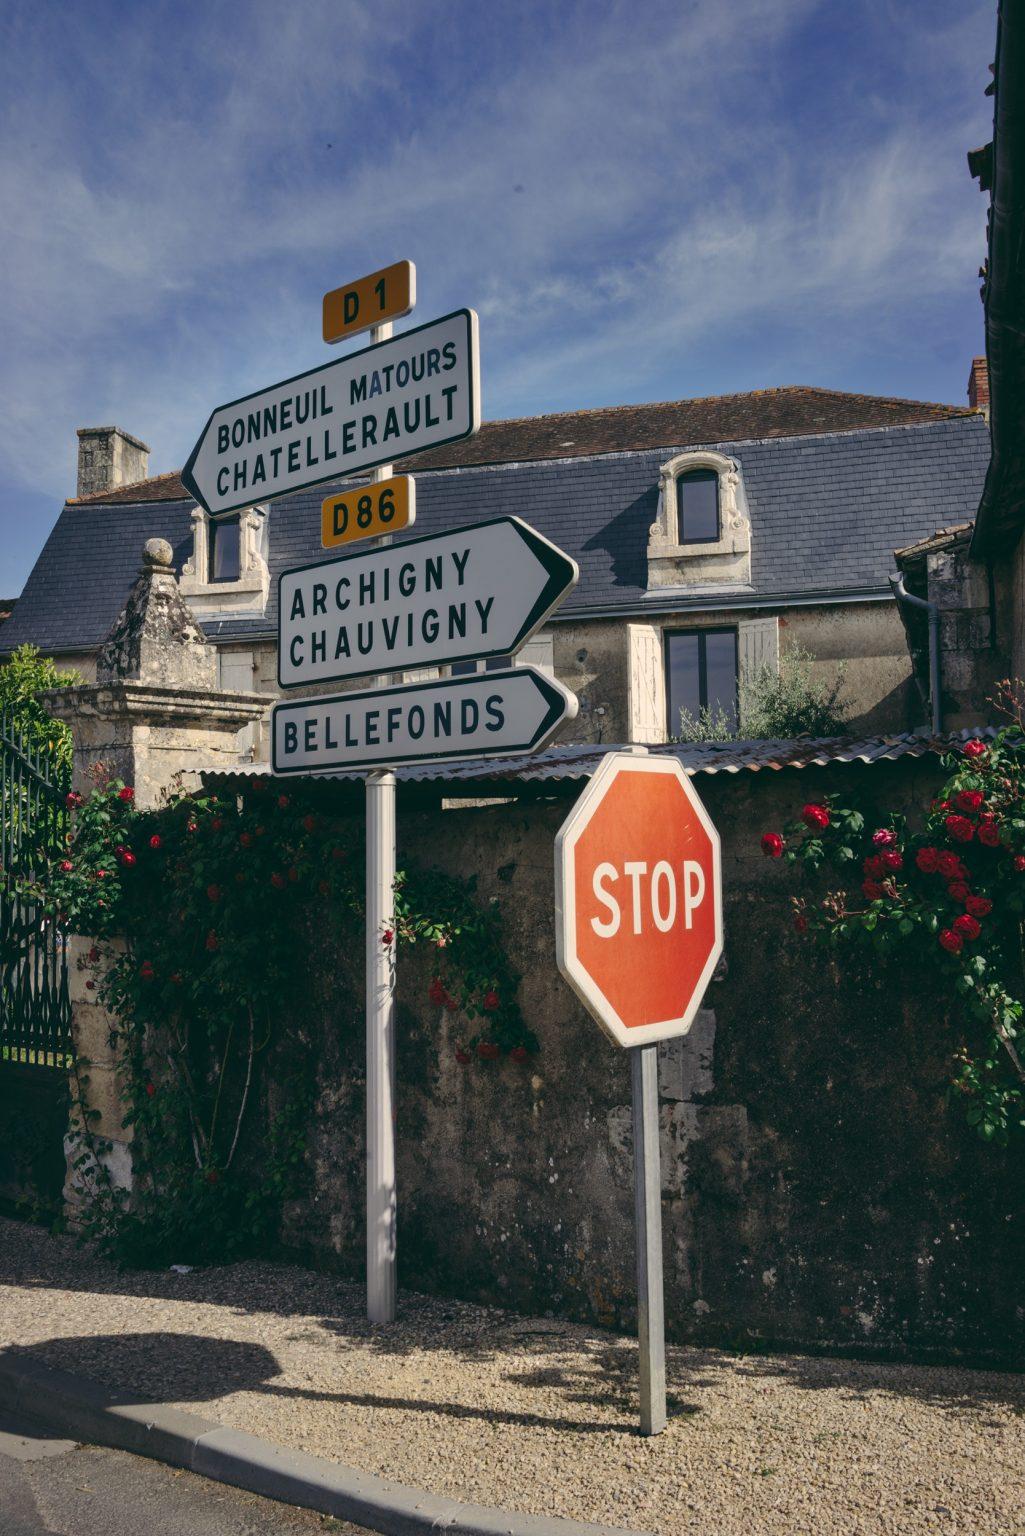 La Chapelle-Moulière, France, May 2017 - Road junction not far from Tristan Plot's former house. ><  La Chapelle-Moulière, Francia, maggio 2017 - Incrocio stradale non lontano dalla vecchia casa di Tristan Plot.*** SPECIAL   FEE   APPLIES *** *** Local Caption *** 01489360